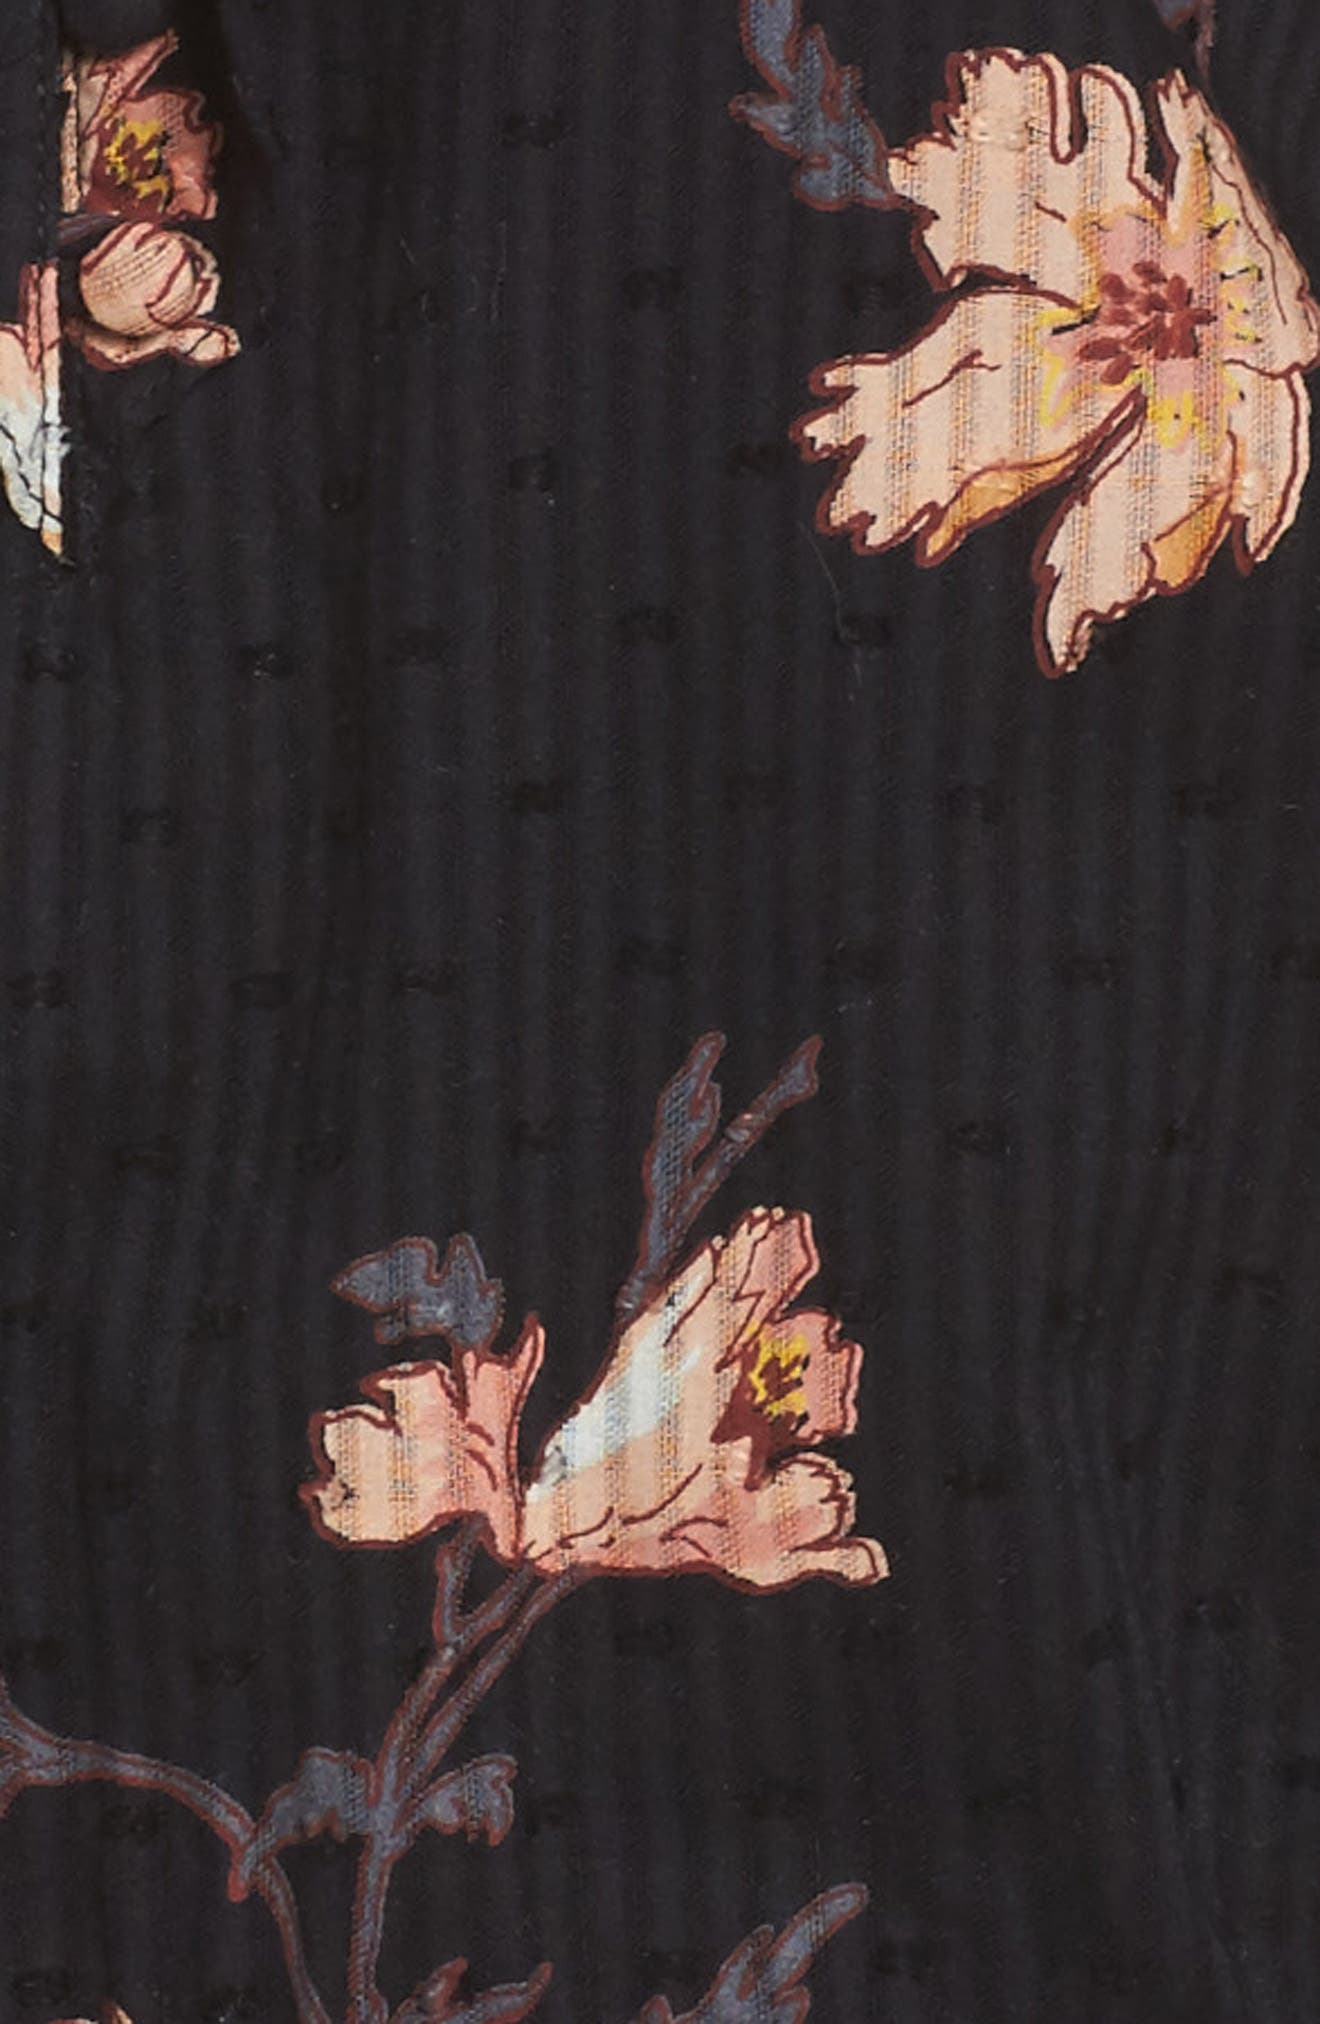 Farfella Floral Print Ruffle Minidress,                             Alternate thumbnail 5, color,                             001